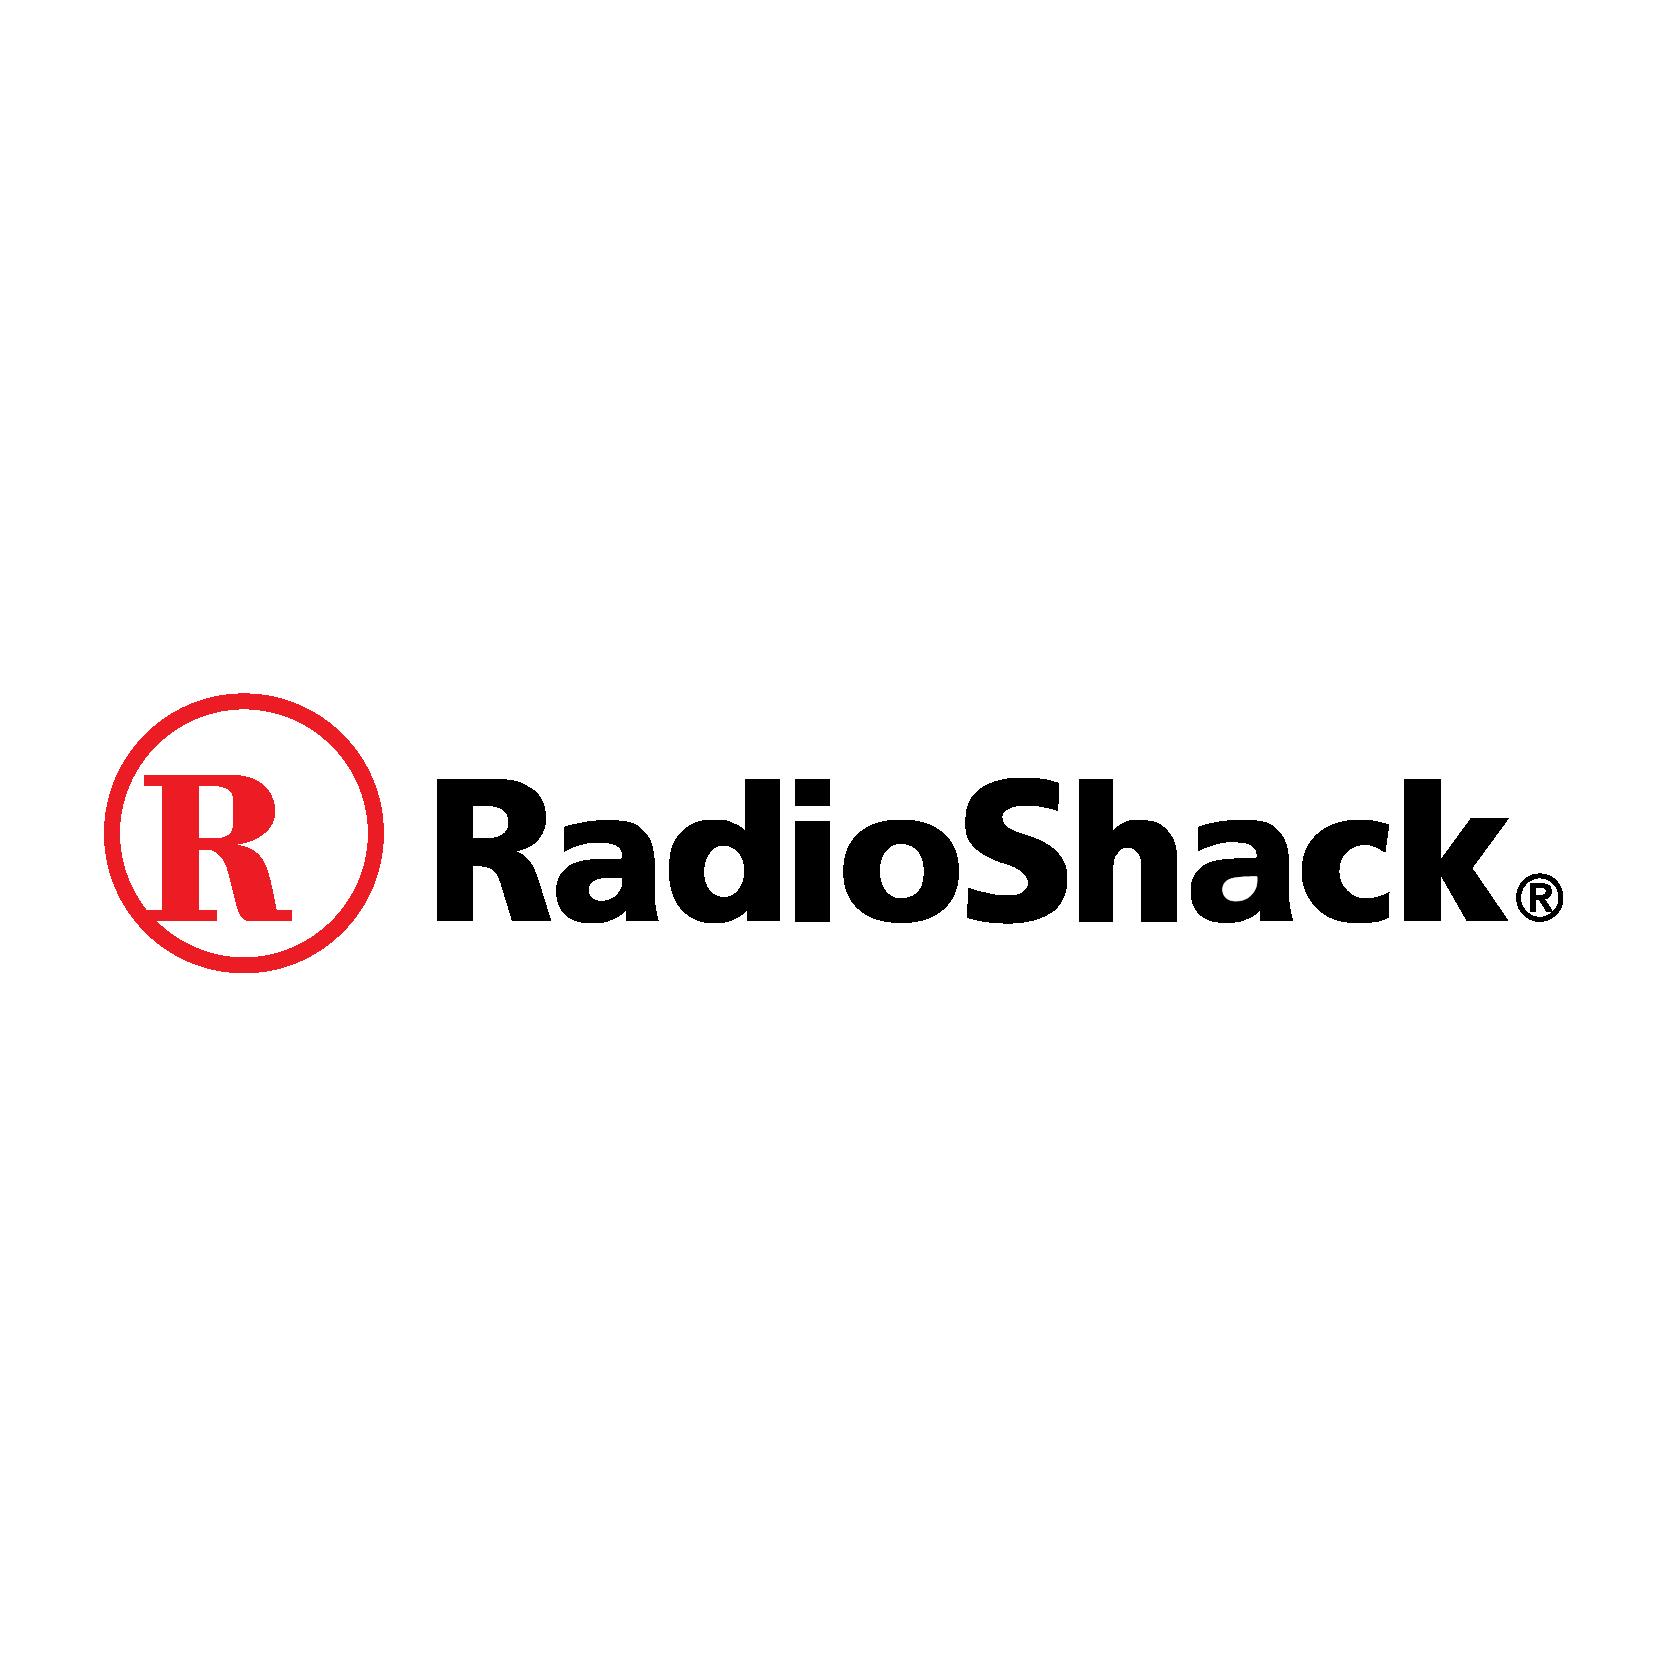 Logos-PagWeb-08